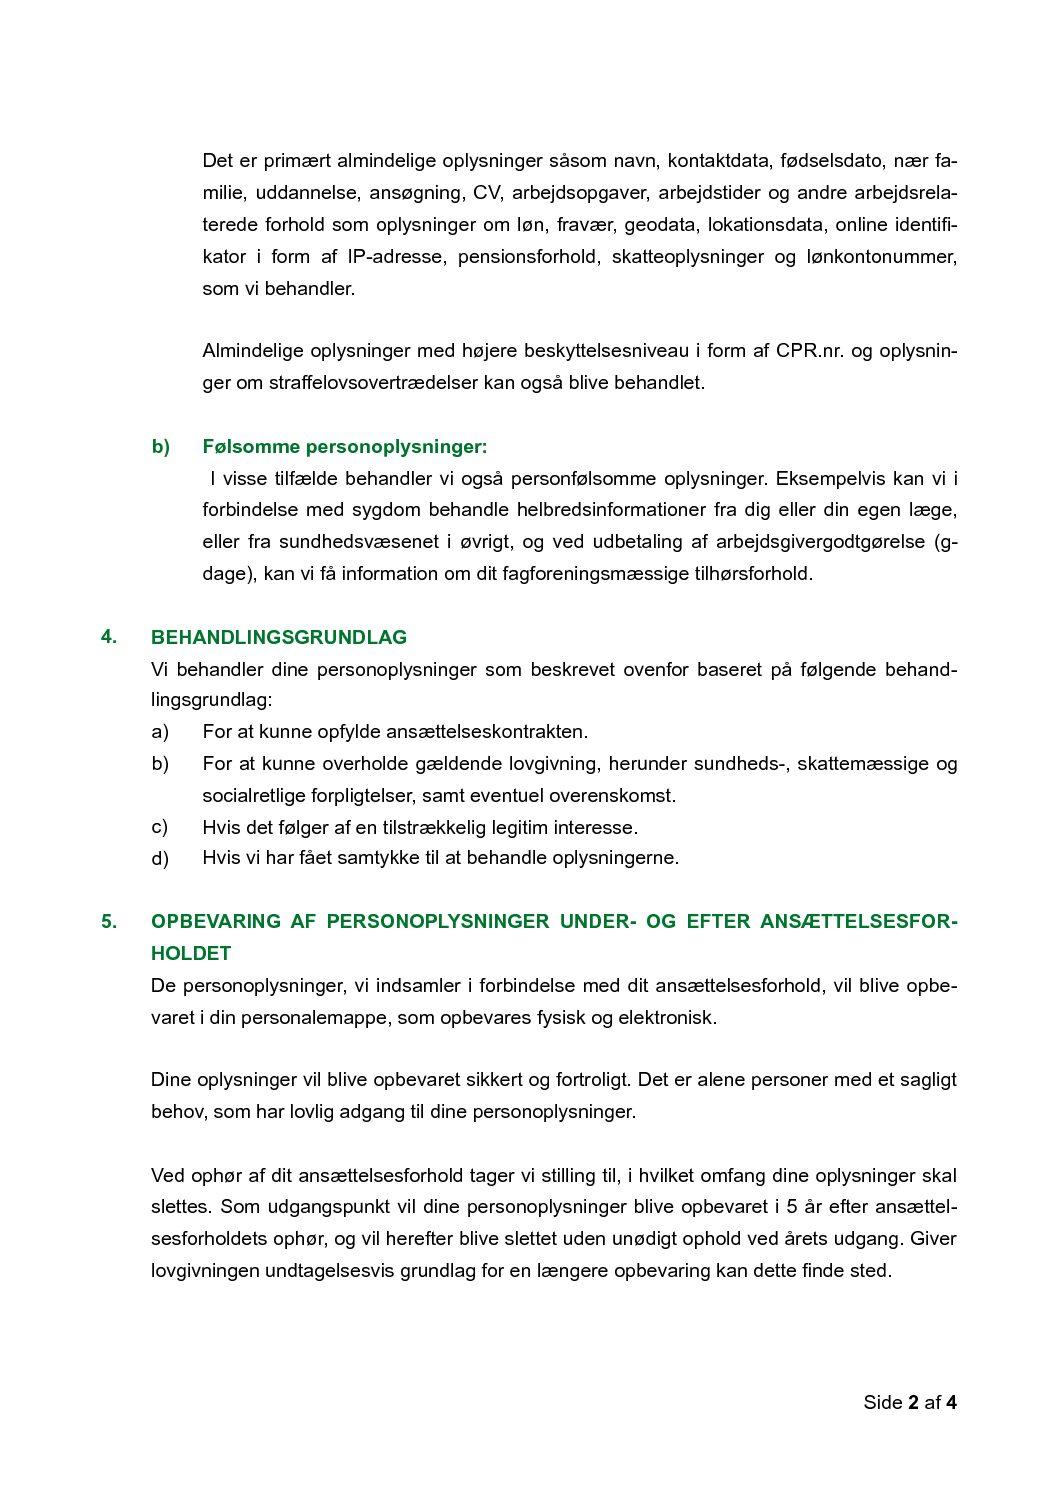 05 Privatlivspolitik, ansatte s. 2